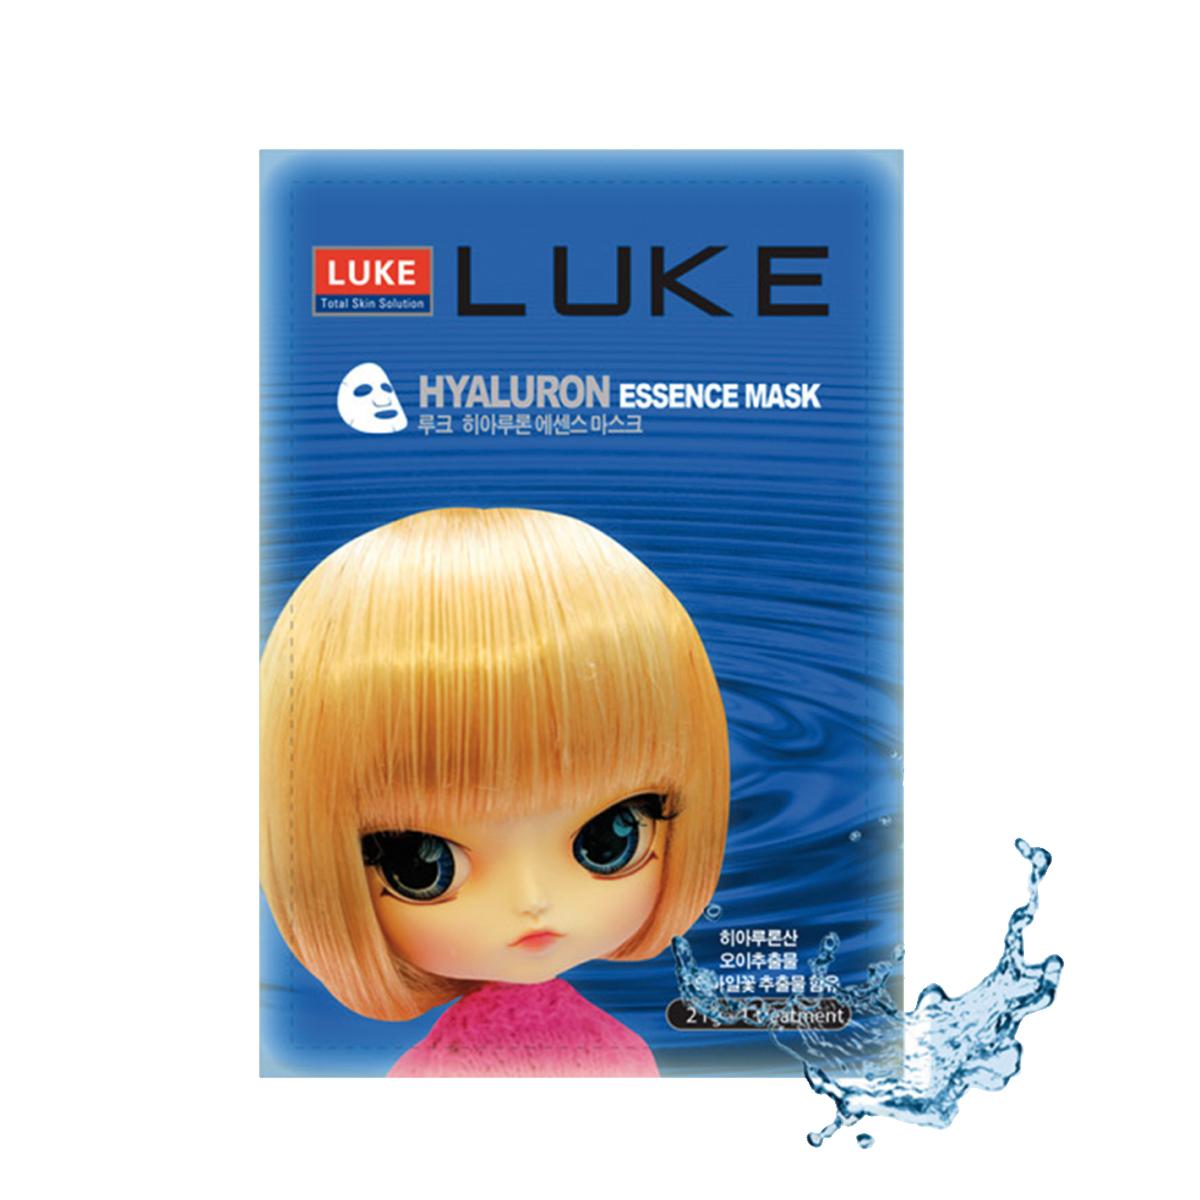 Luke Маска с гиалуроновой кислотой Hyaluron Essence Mask 21 г lucky luke vol 57